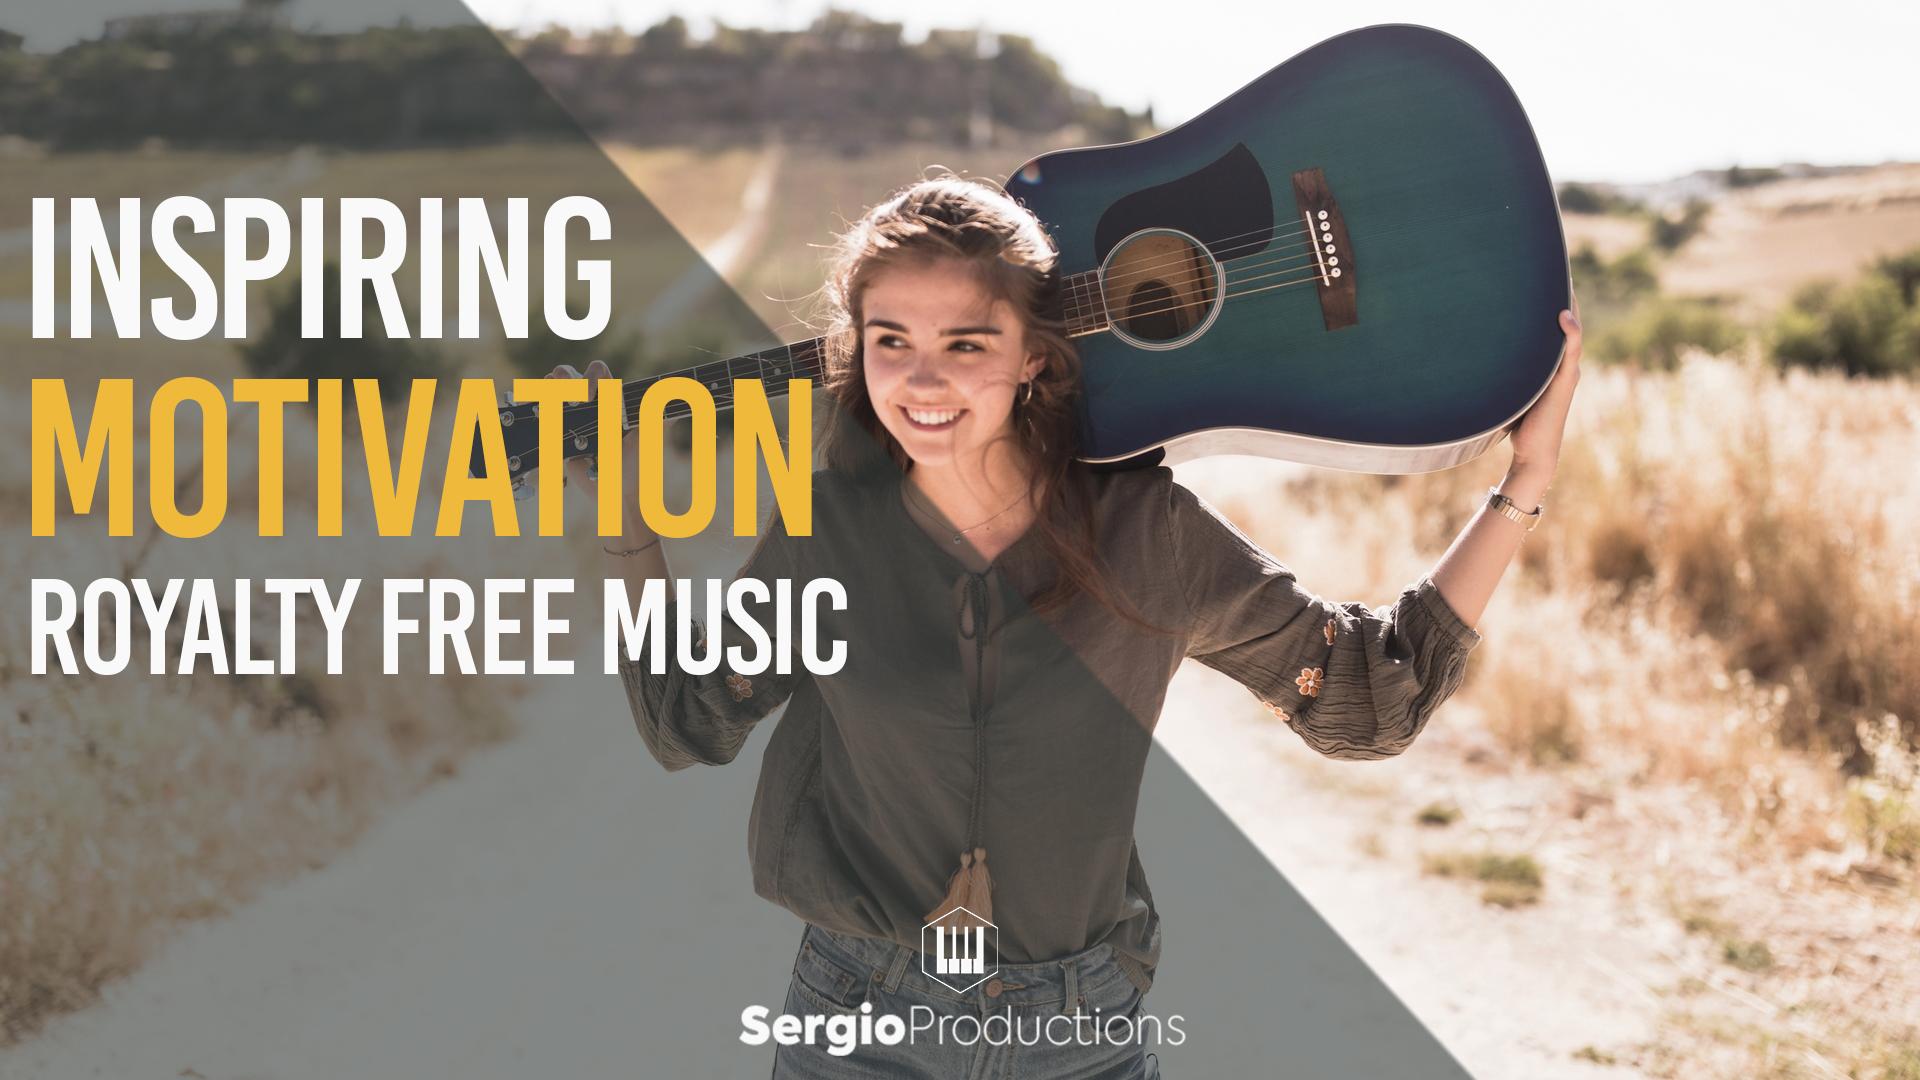 Acoustic-Guitar-Inspiring-Romantic-Motivation